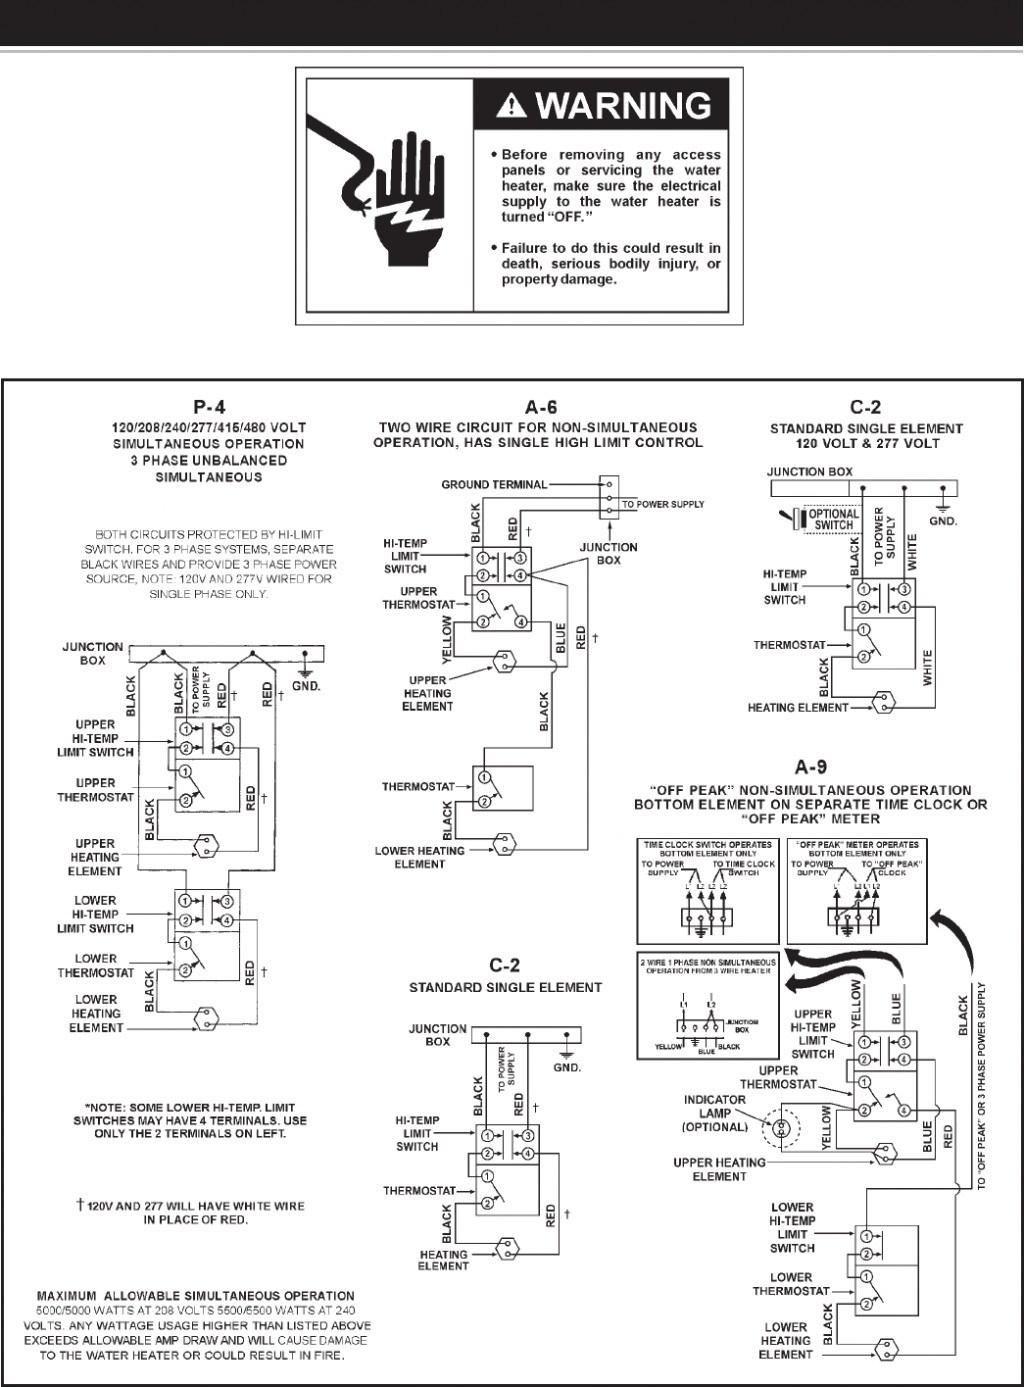 A O Smith Motors Wiring Diagram